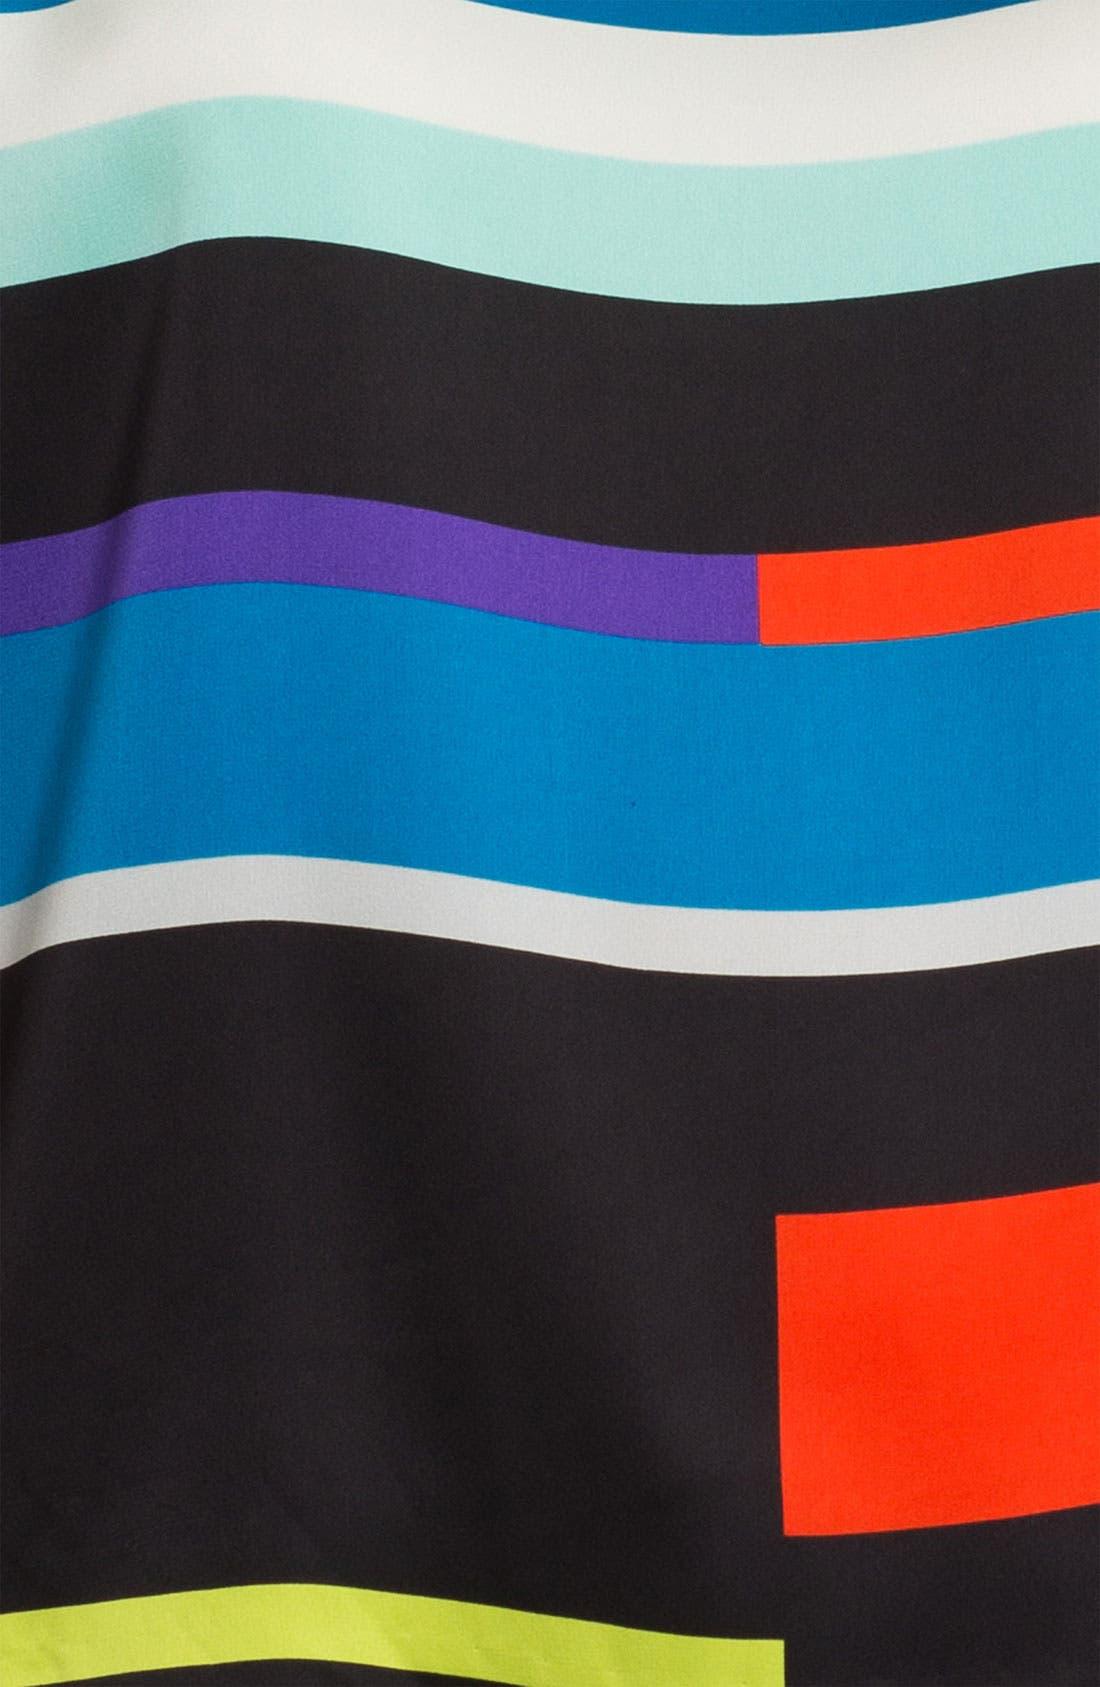 Alternate Image 3  - Vince Camuto 'Graphic Lines' Blouse (Petite)